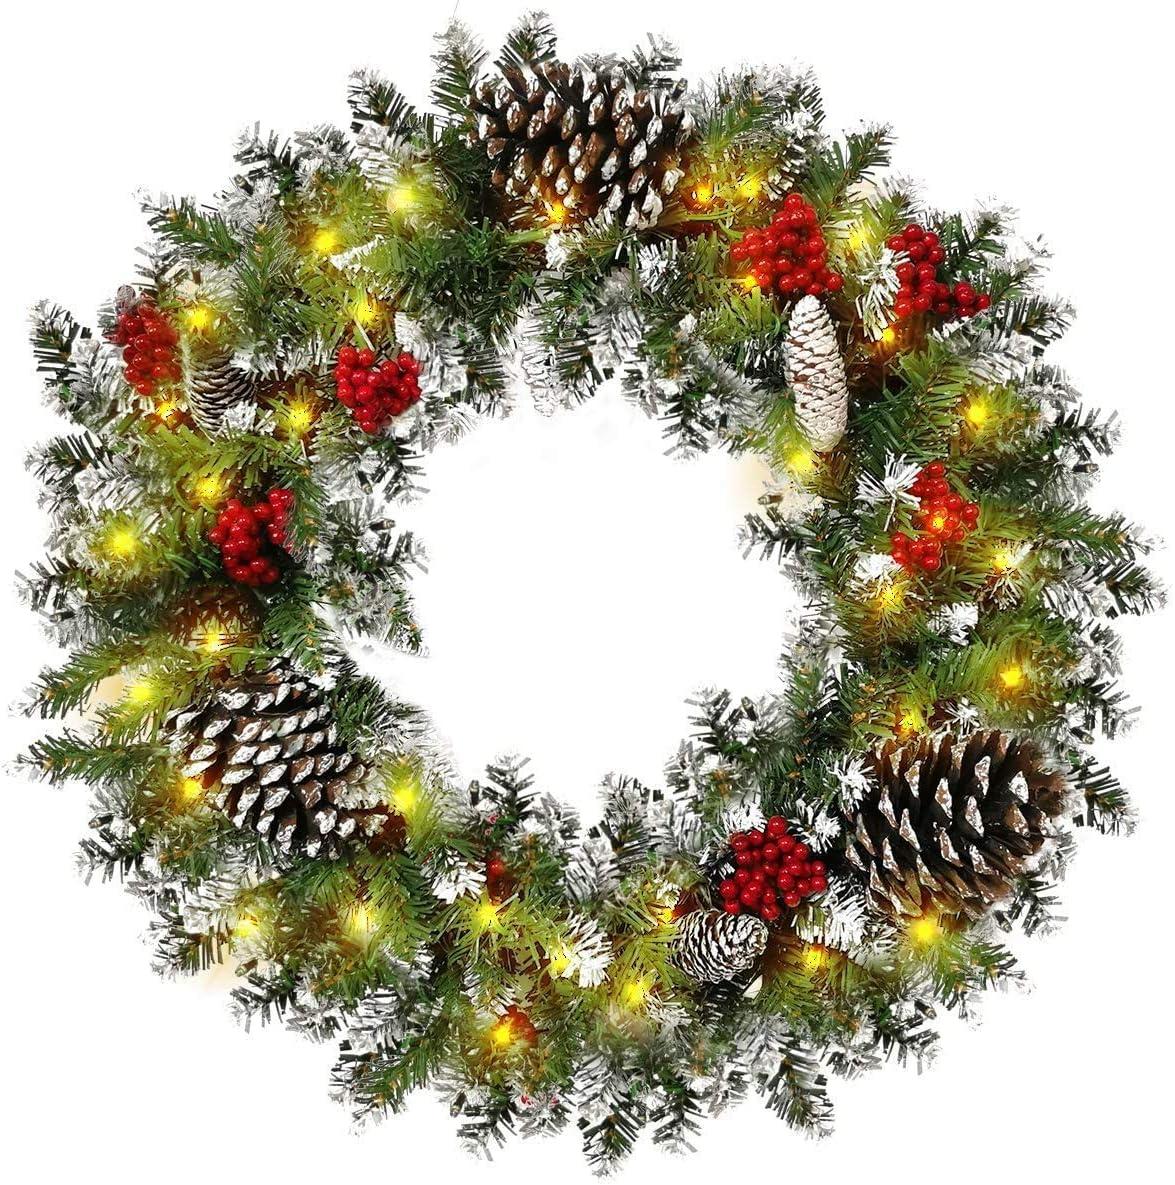 Leaflai Christmas Wreath Windows Outdoor Artificial Garland Xmas LED Light Wreath 24 Inch Home Christmas Wreath Decor Farmhouse Windows